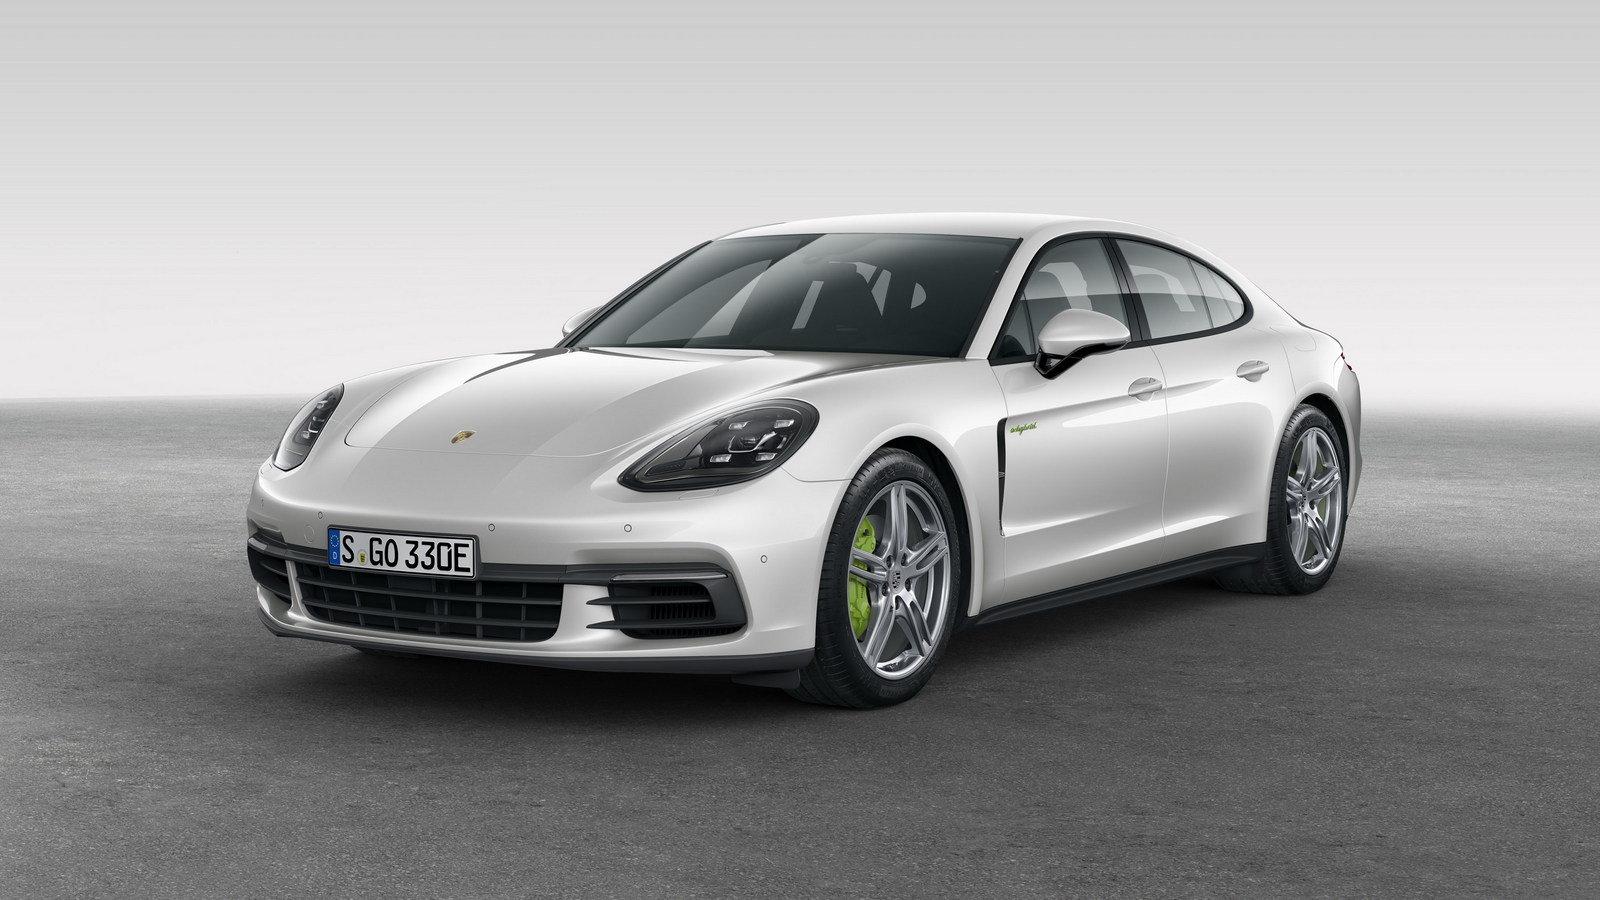 2018 Porsche Panamera 4 E Hybrid Front View